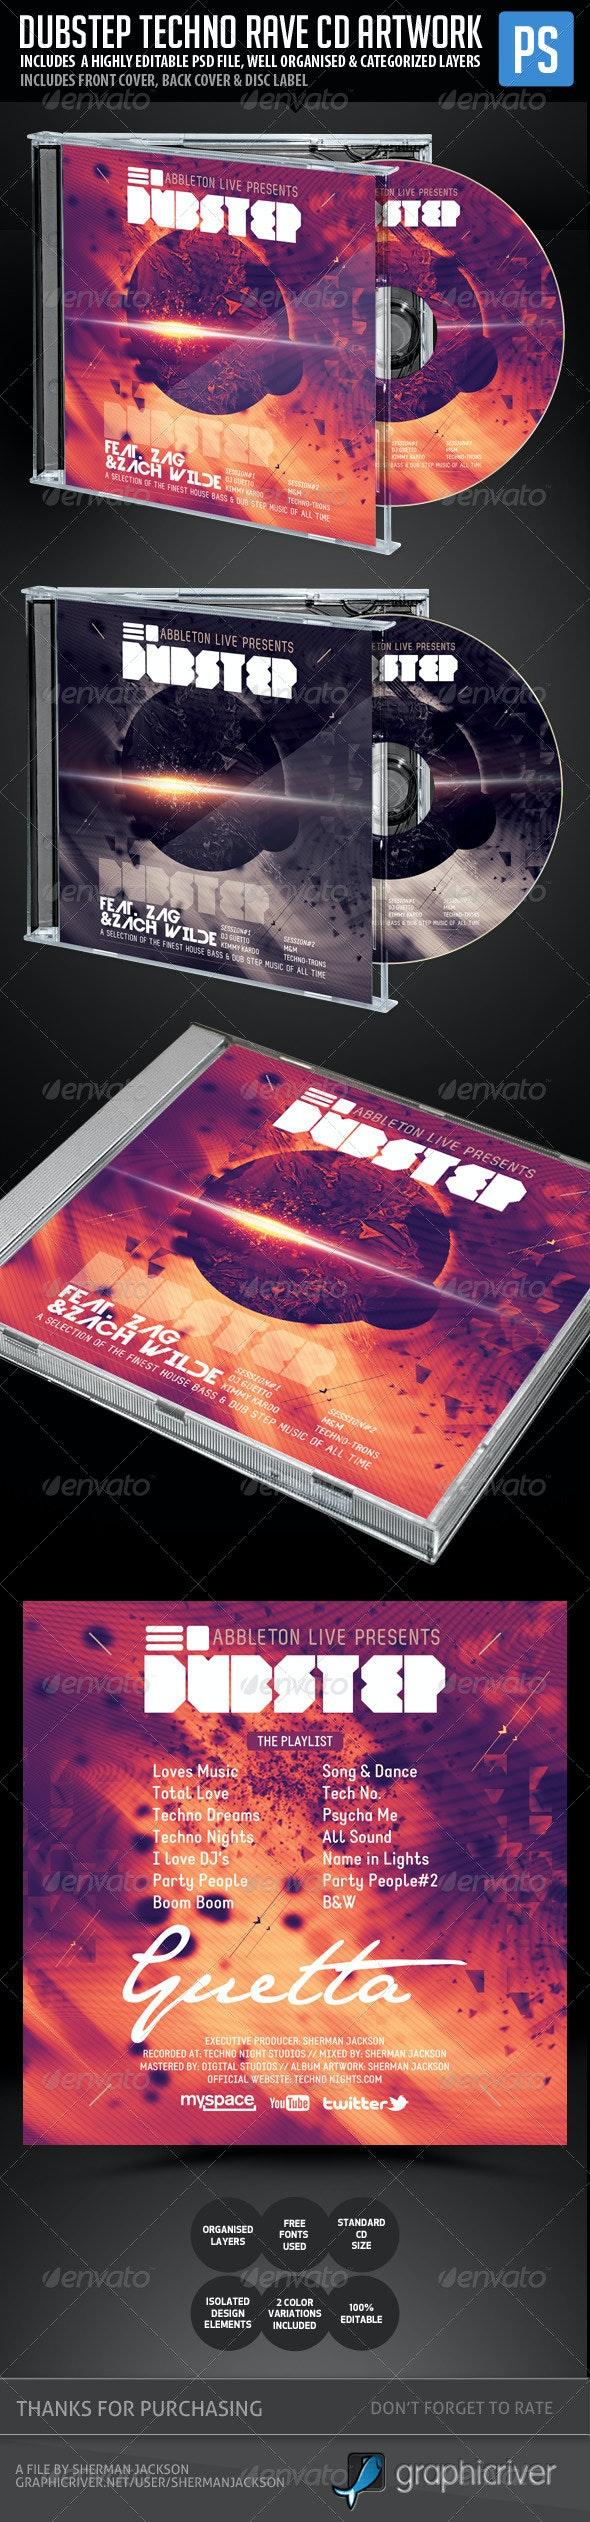 Dubstep, Techno, Rave CD Template - CD & DVD Artwork Print Templates